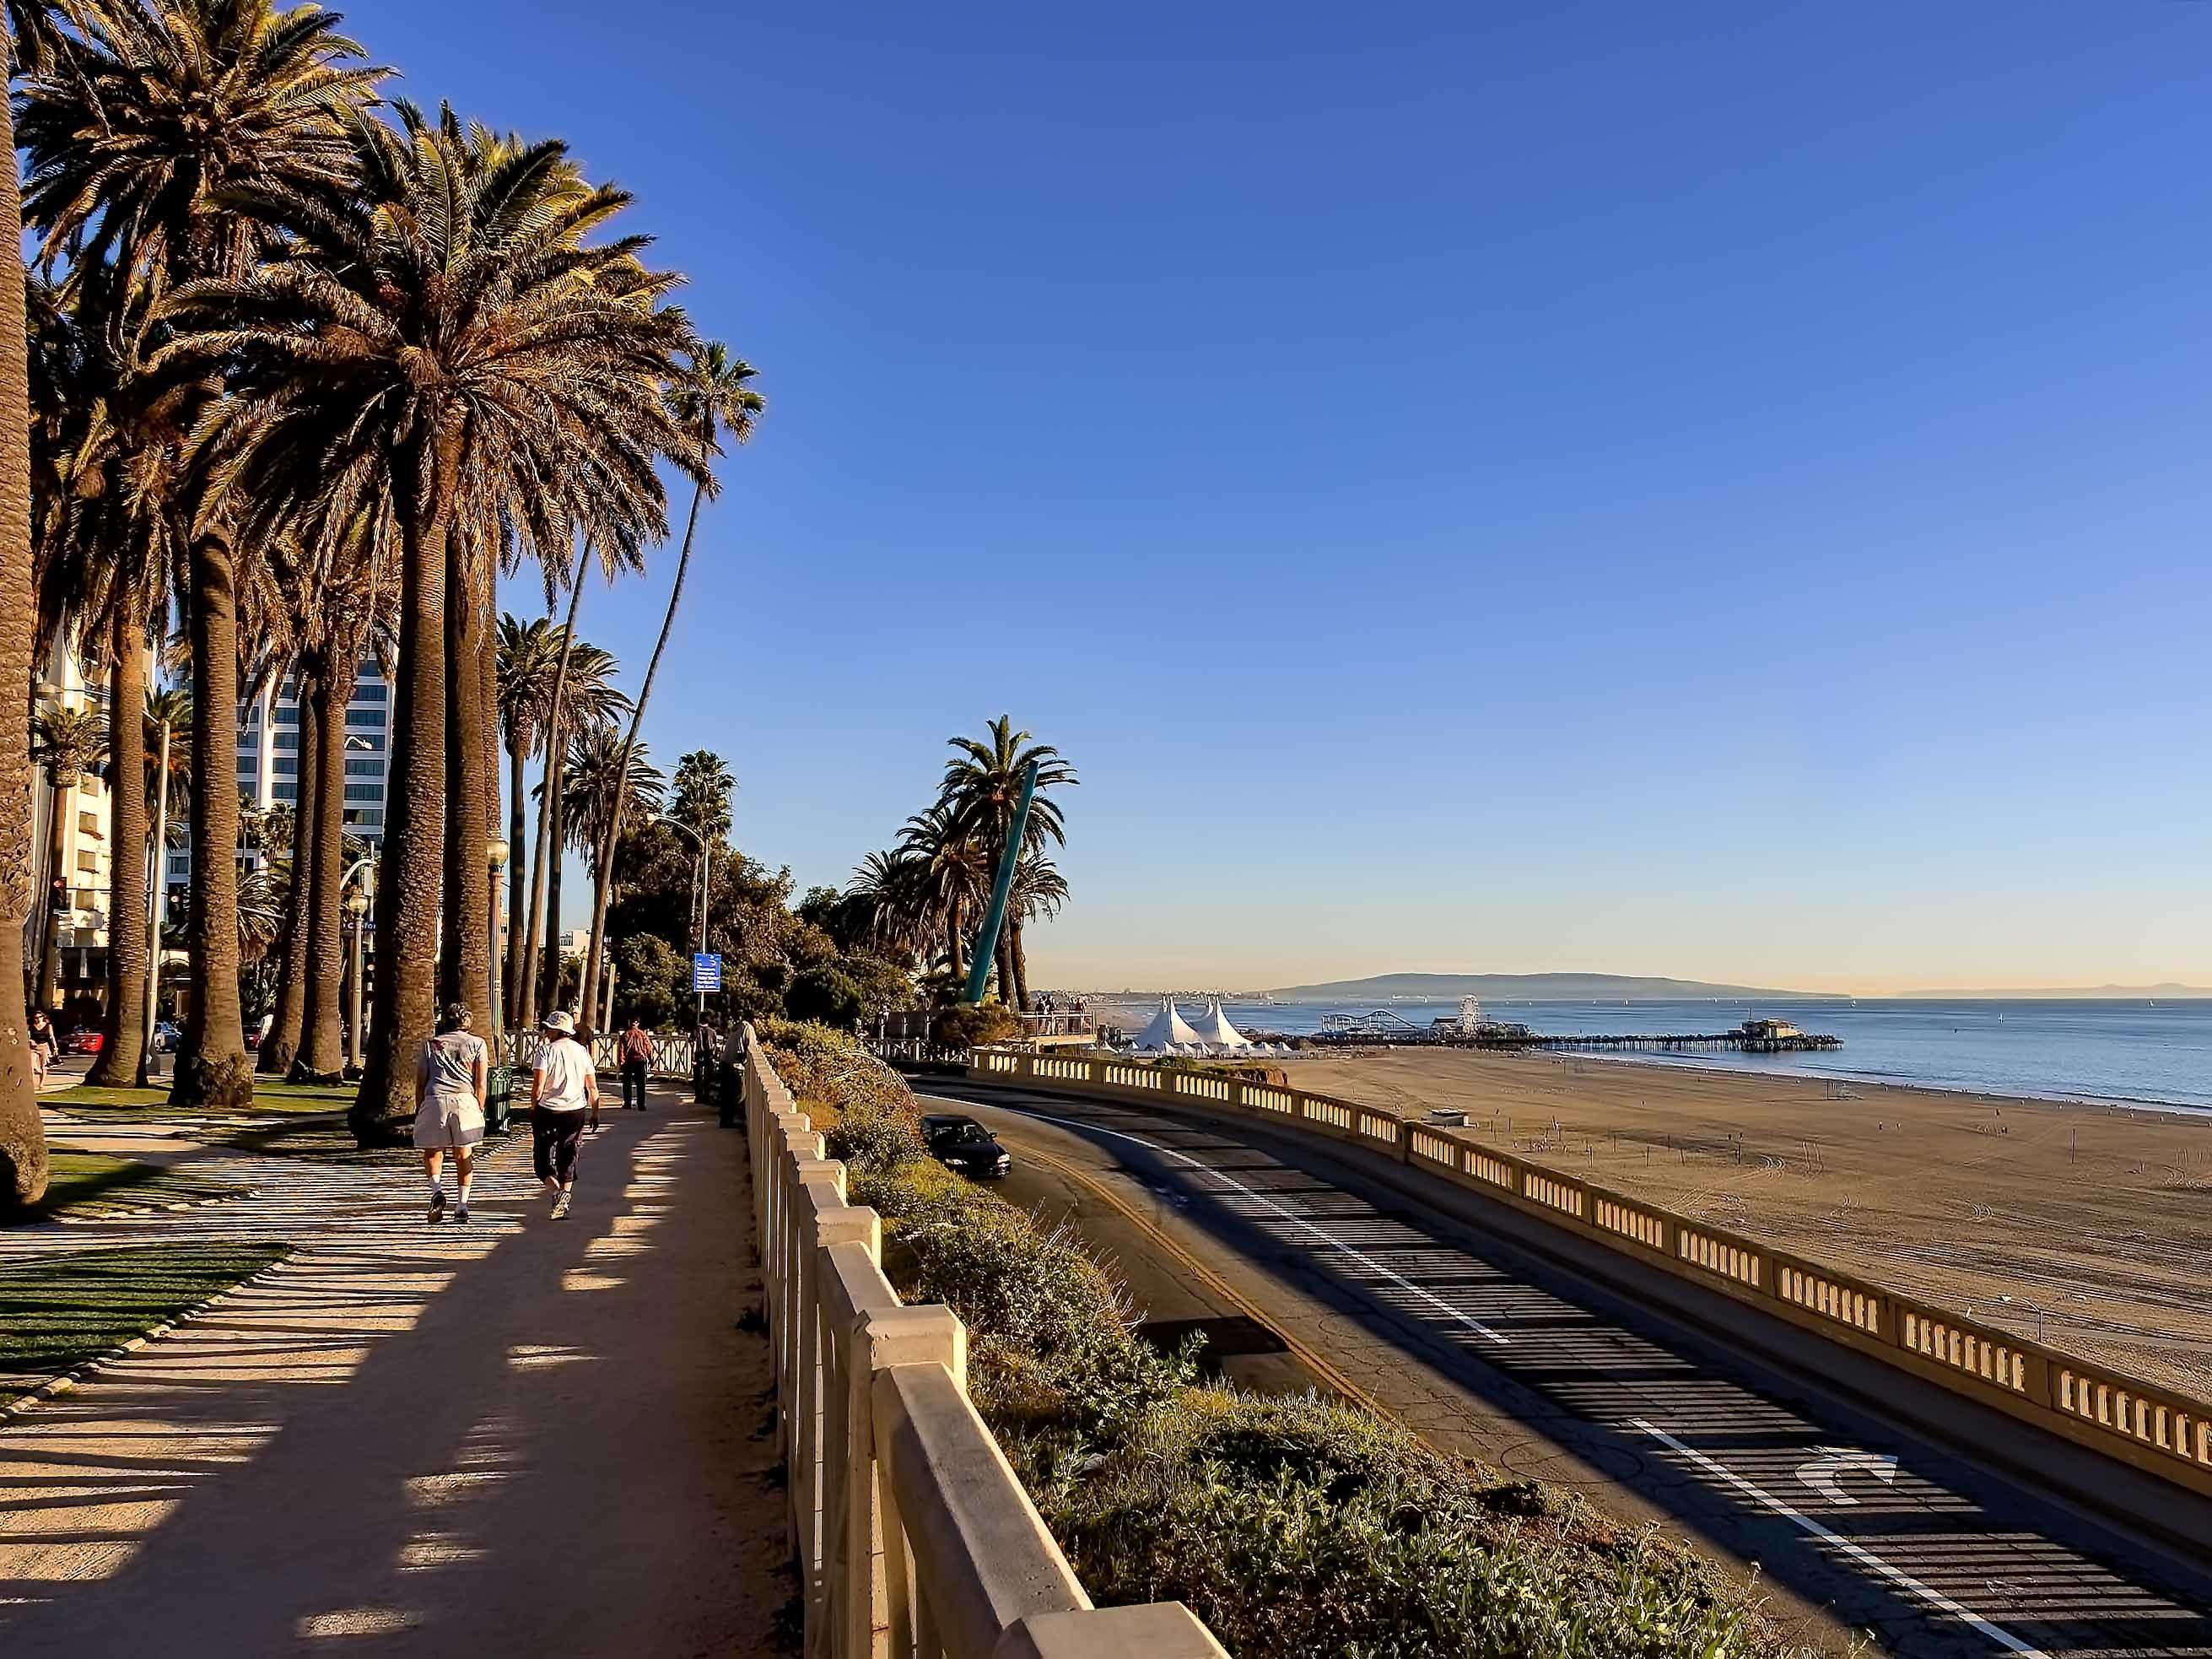 Palisades Park, Los Angeles